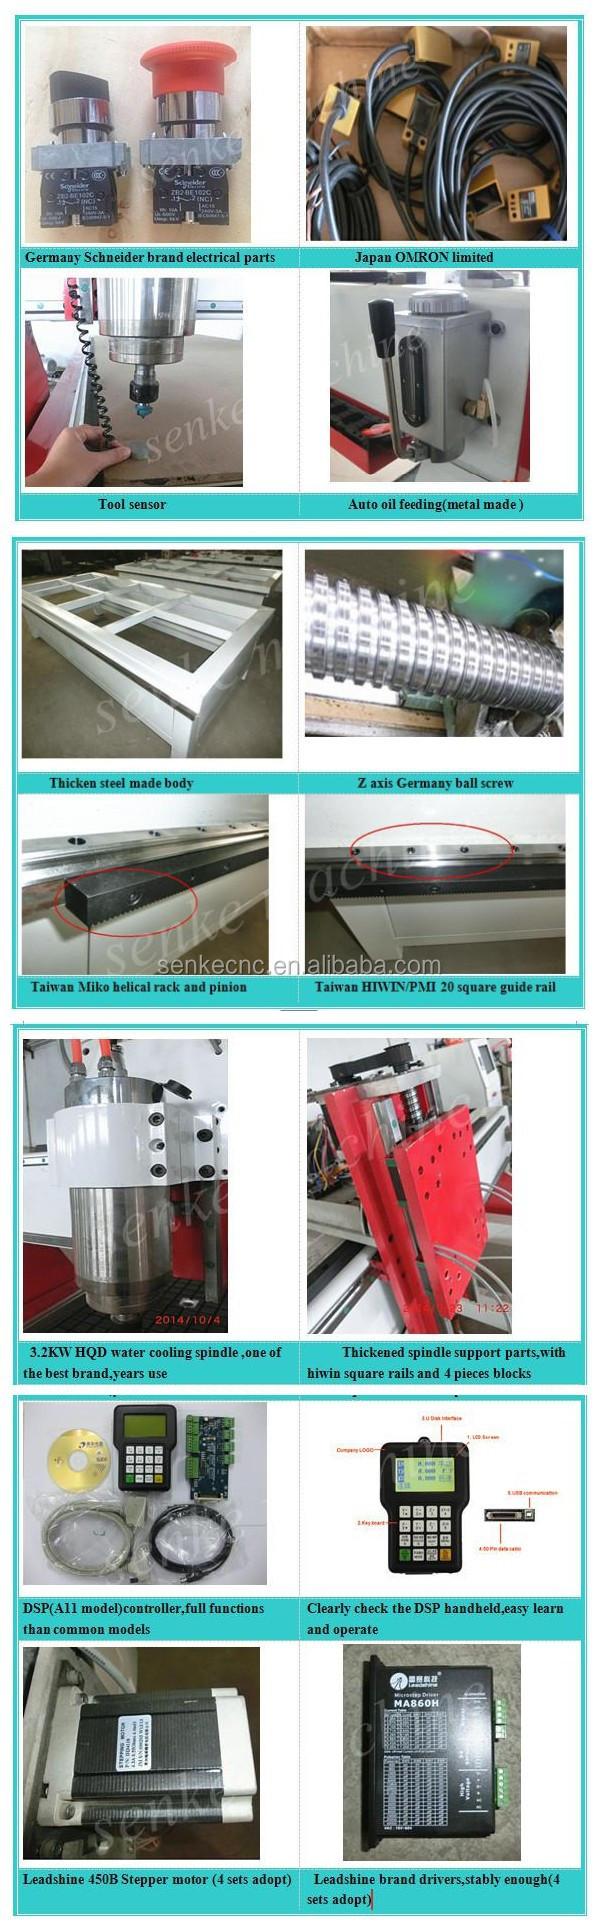 cnc machine for knife making